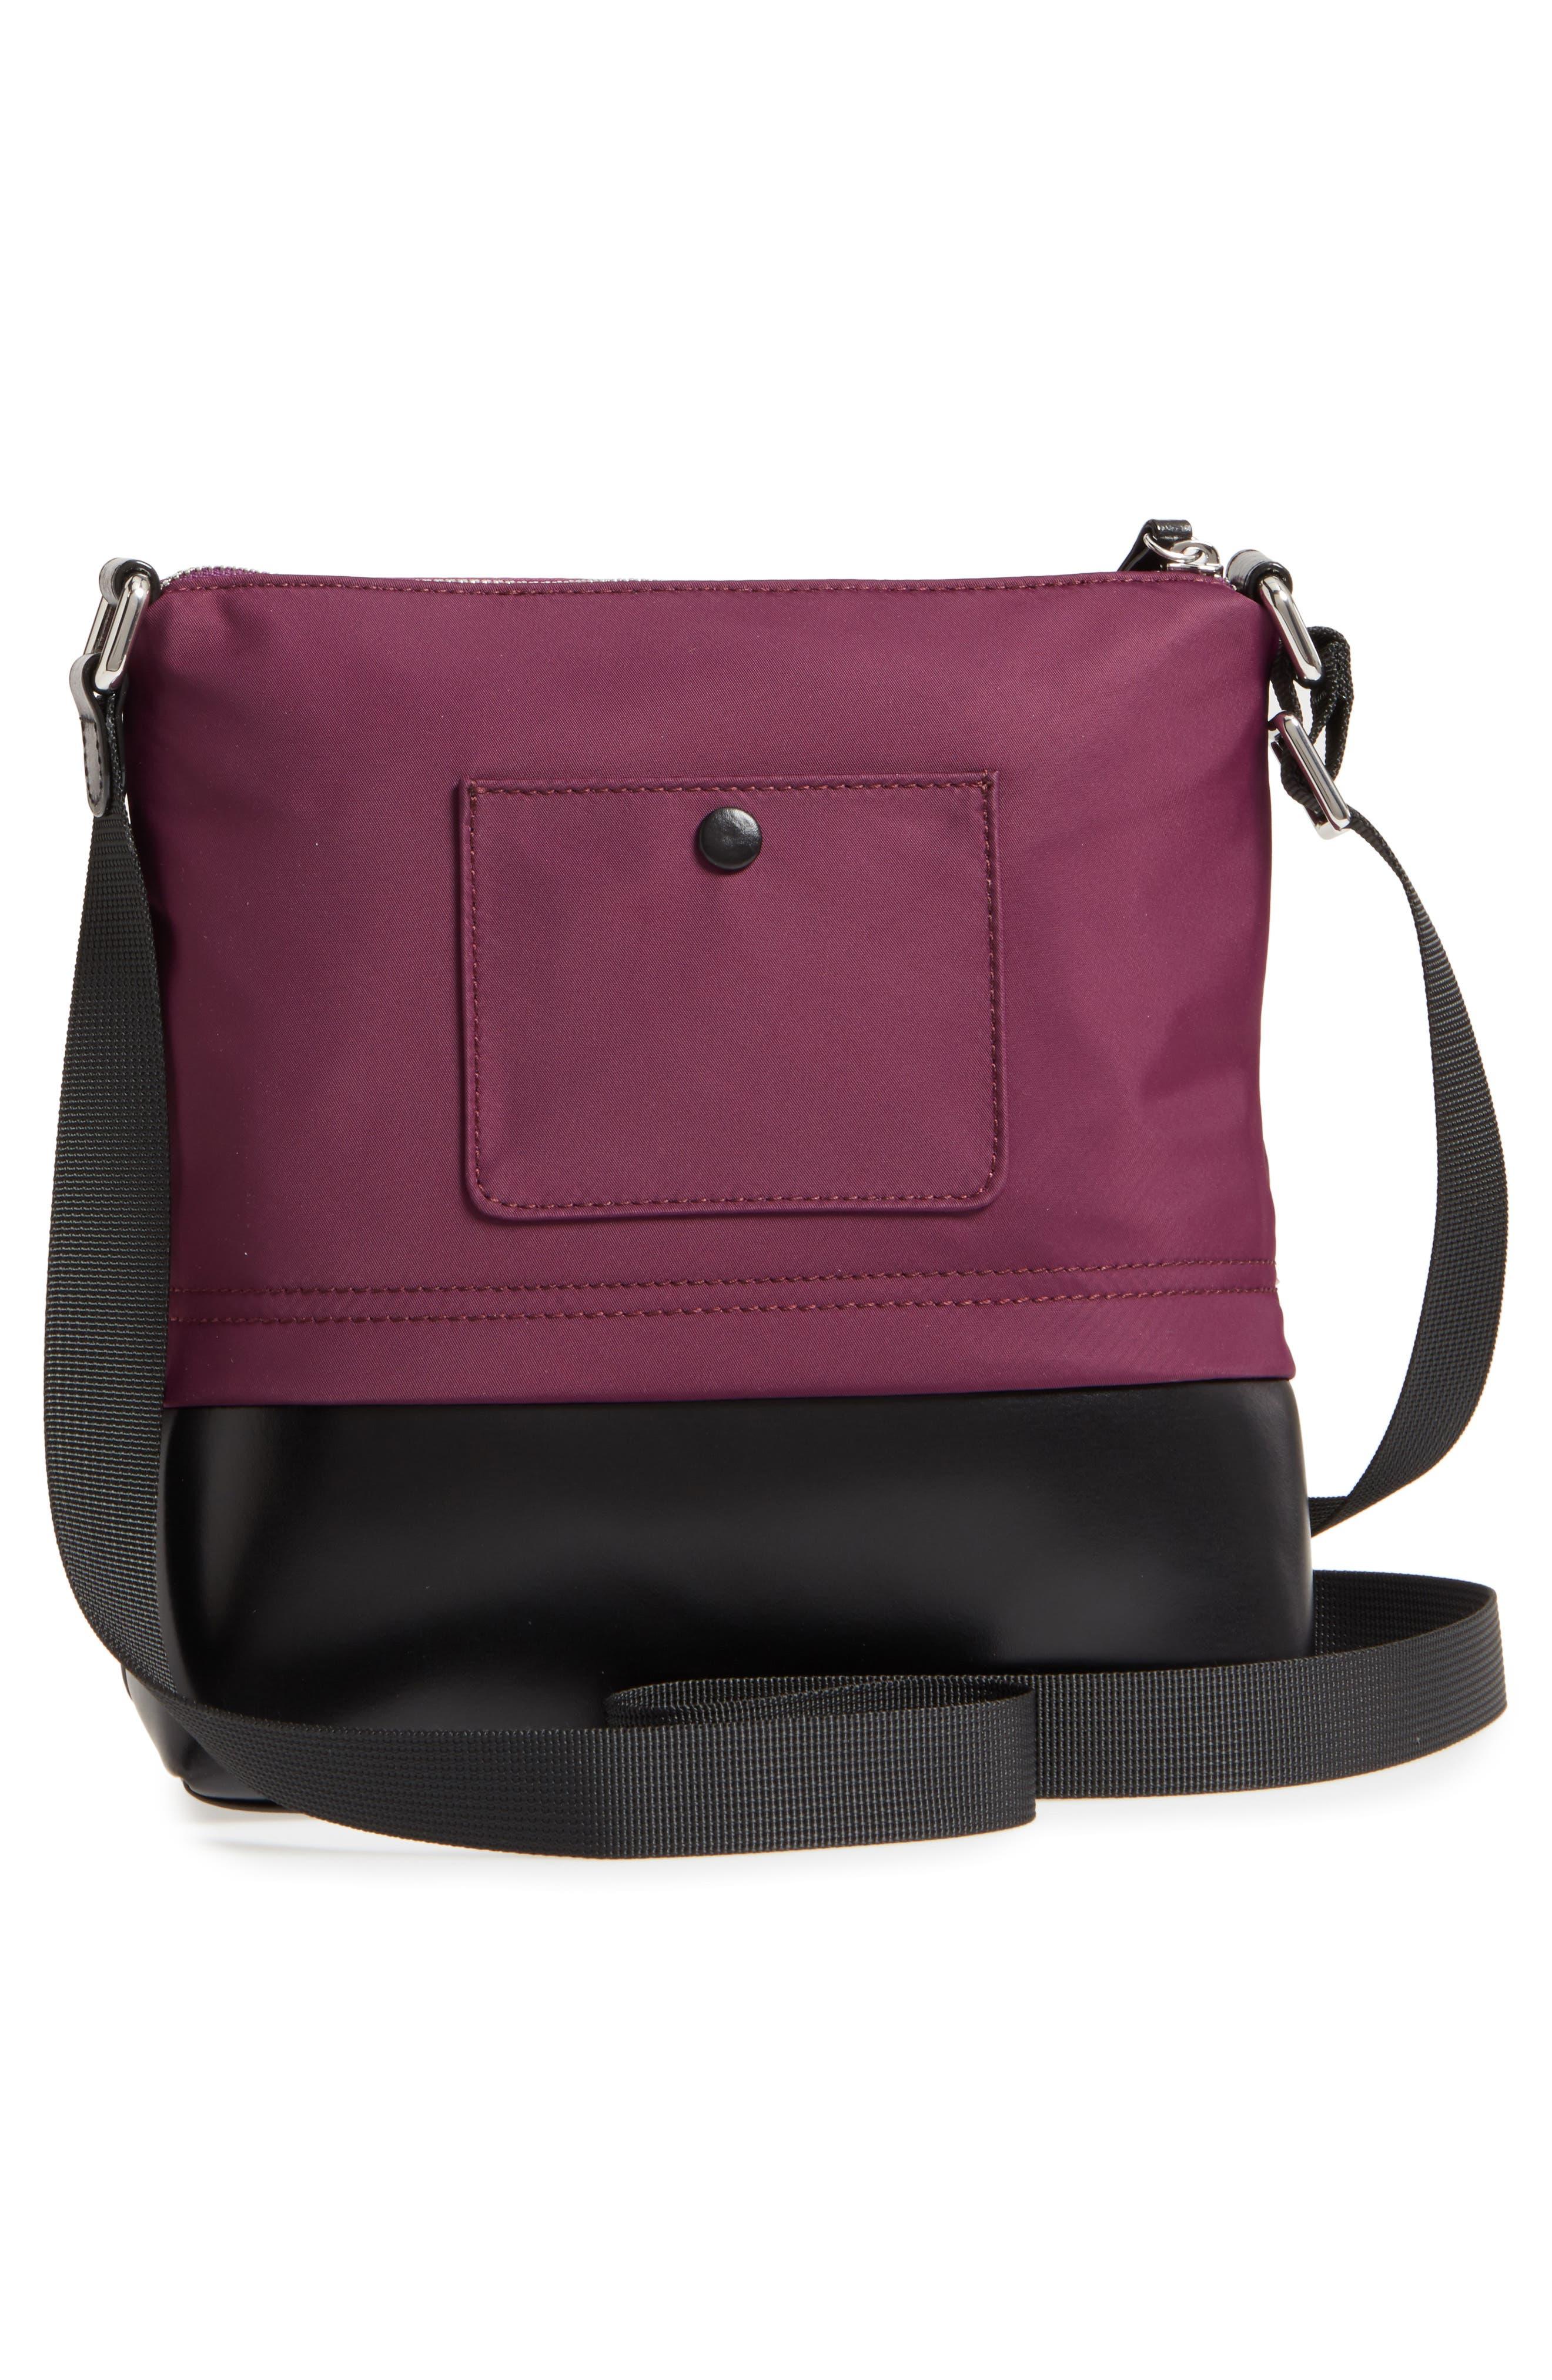 Wanda RFID Nylon & Leather Crossbody Bag,                             Alternate thumbnail 3, color,                             500